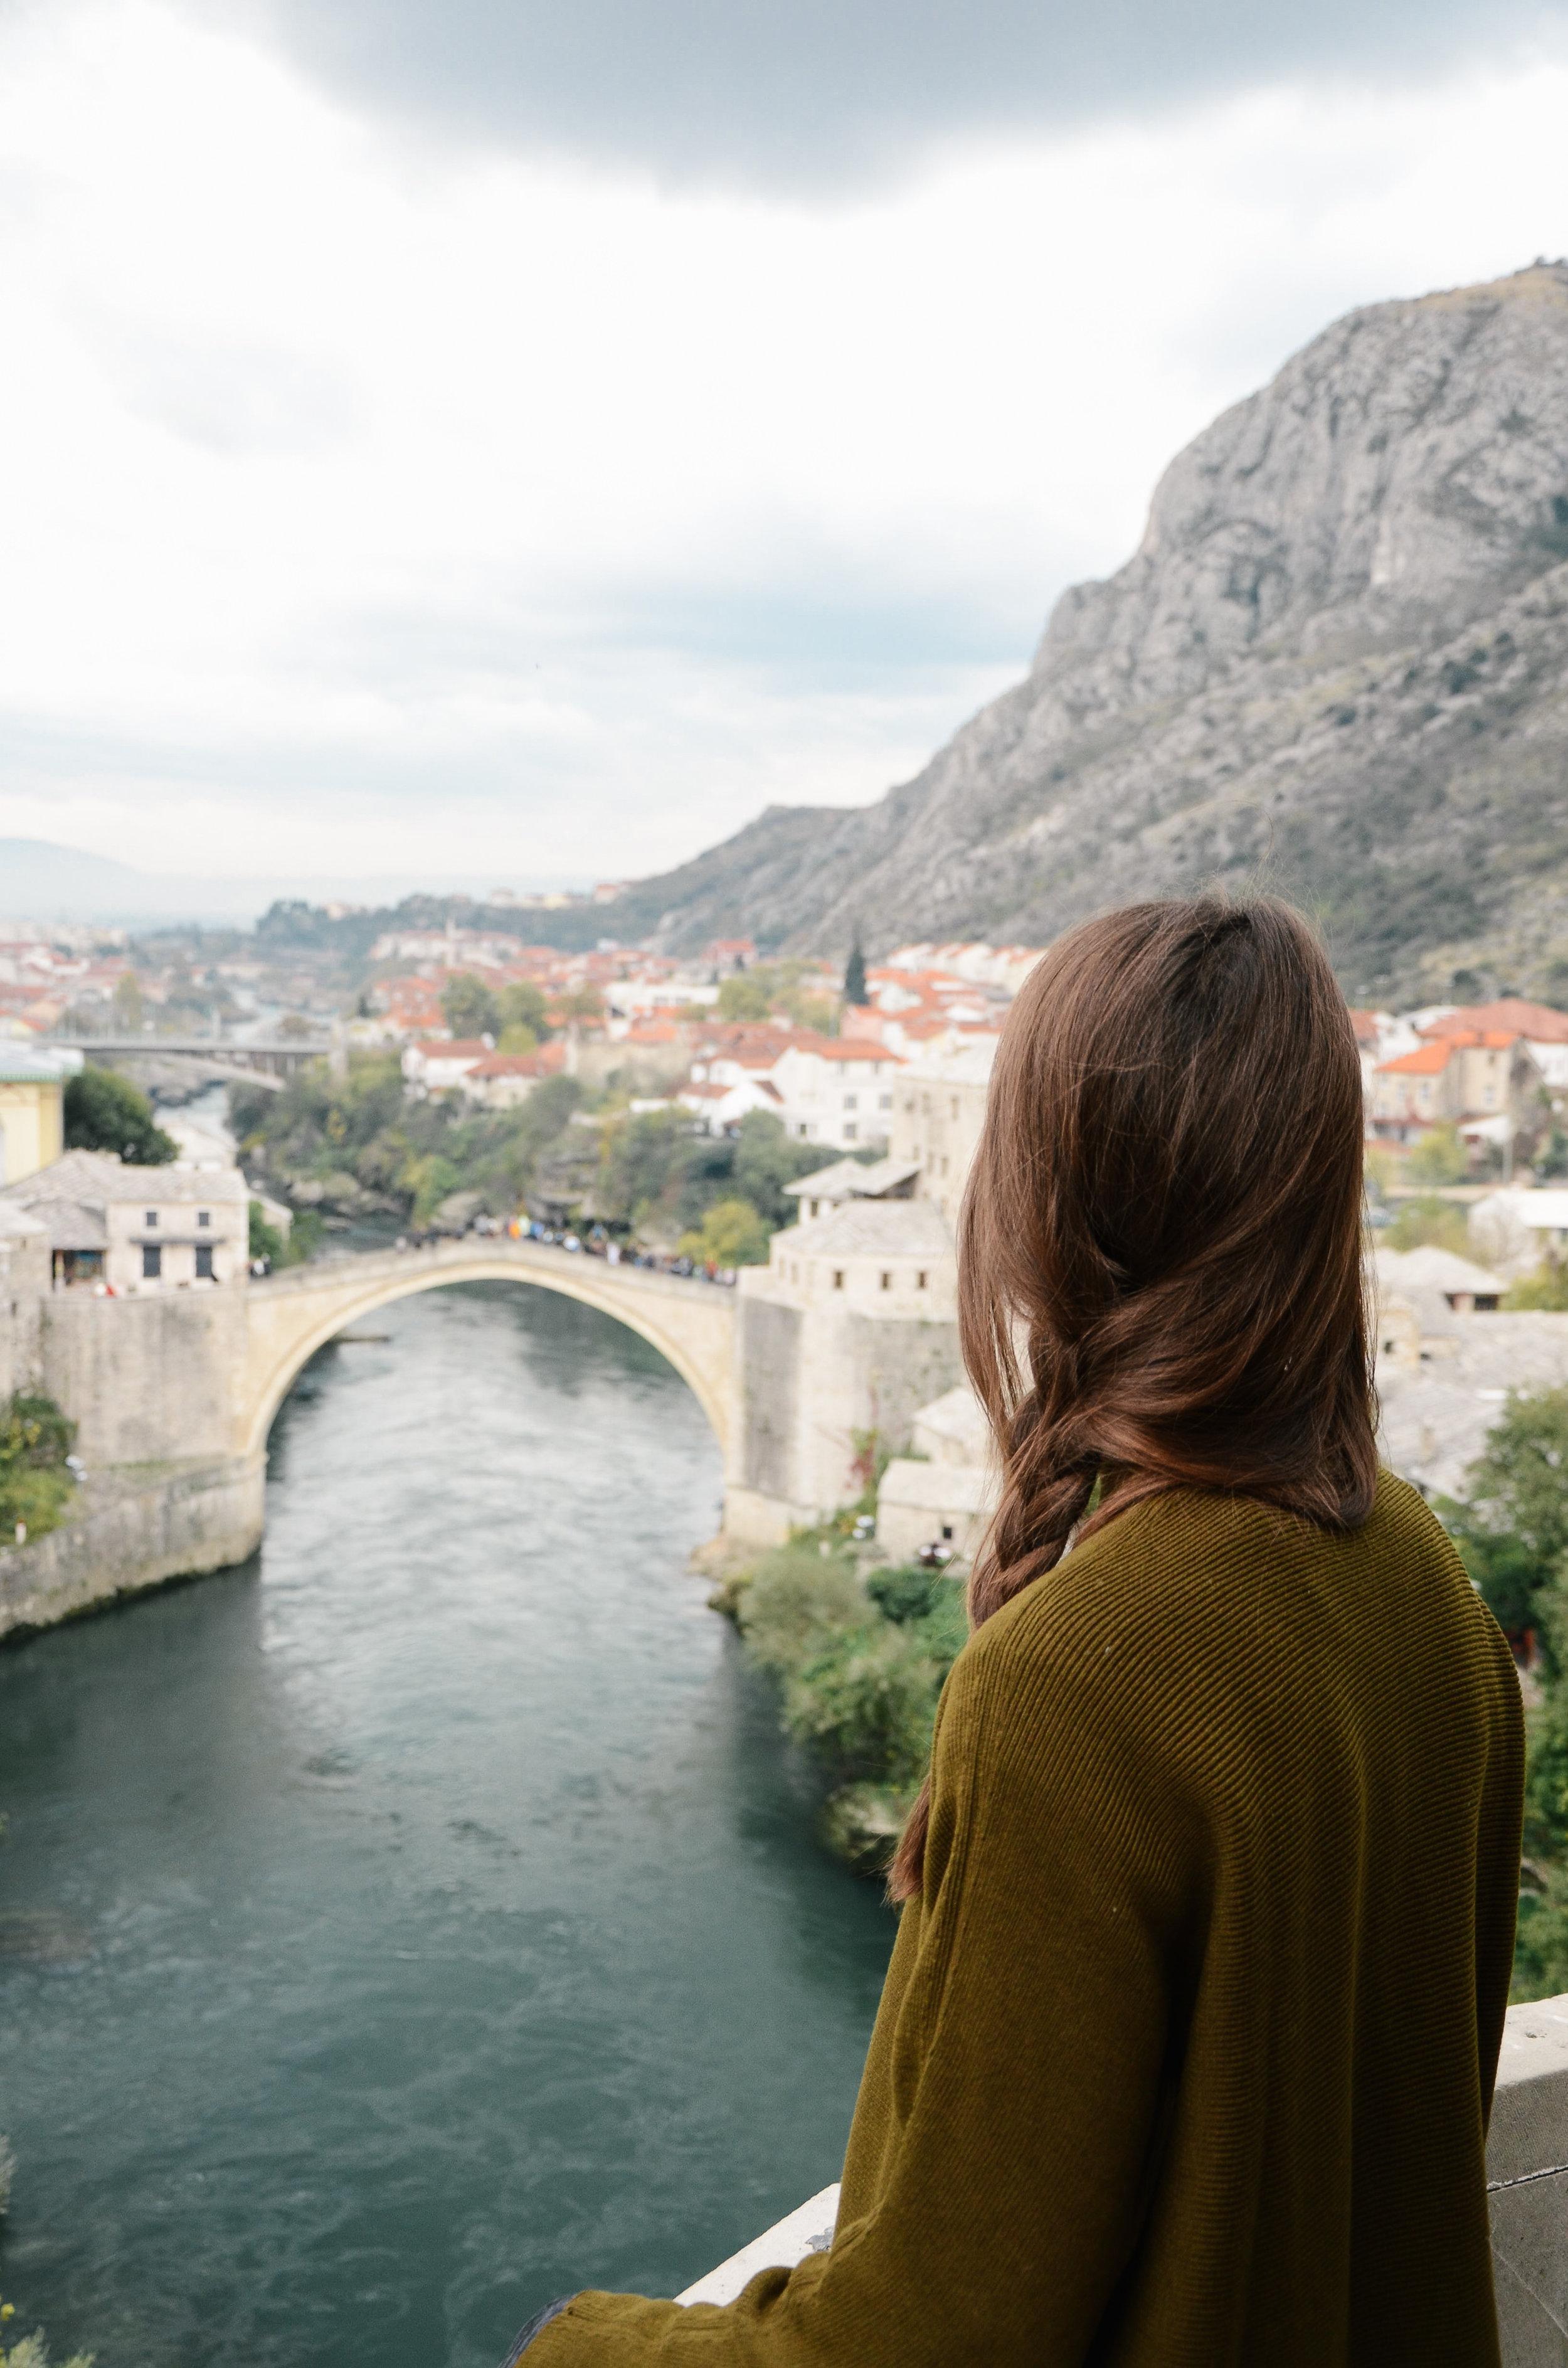 mostar-bosnia-travel-guide-lifeonpine_DSC_3219.jpg